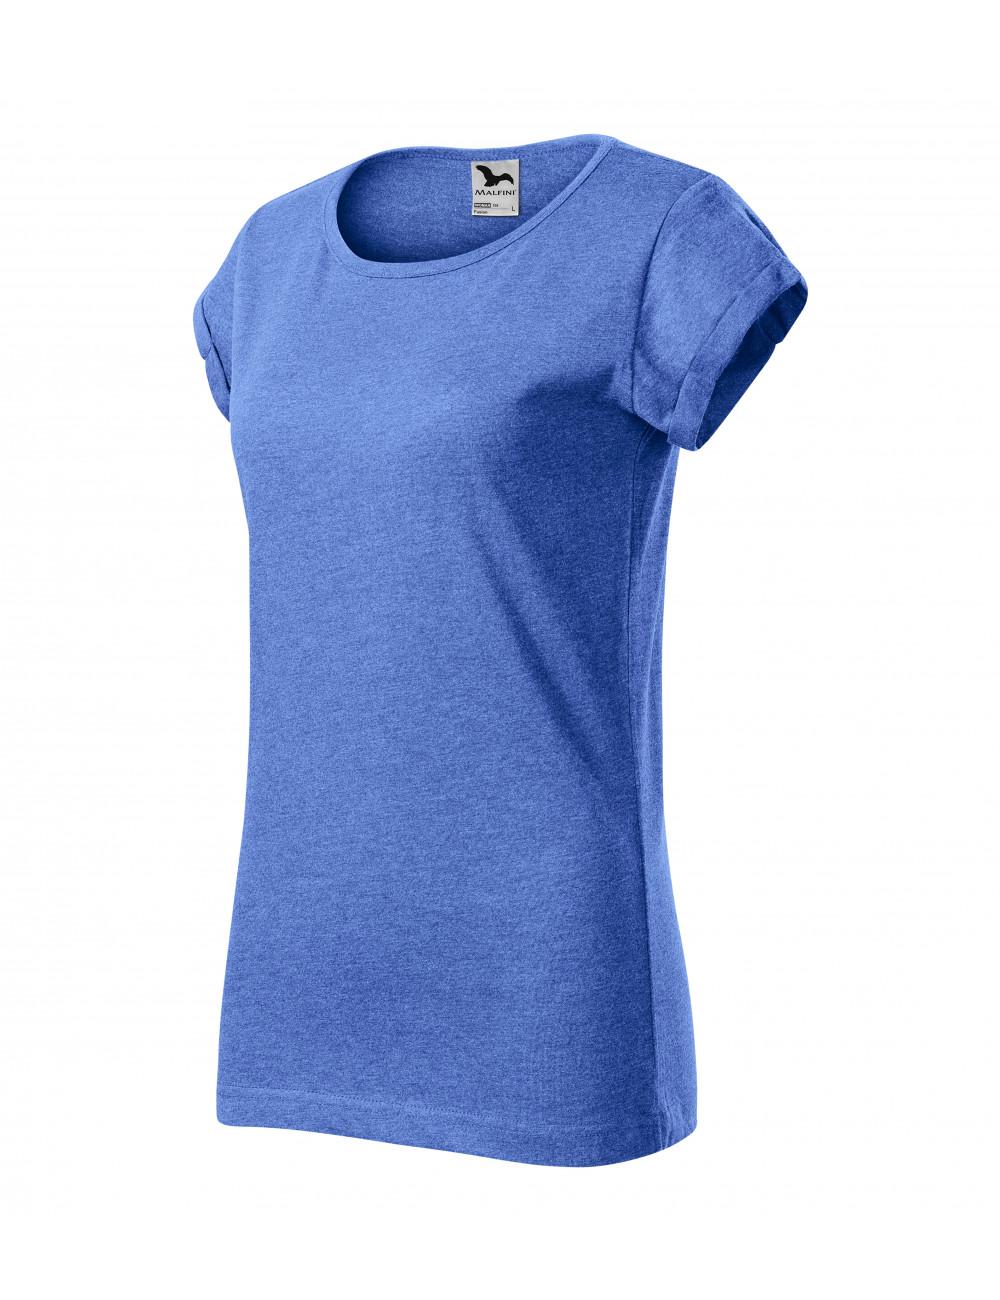 Adler MALFINI Koszulka damska Fusion 164 niebieski melanż